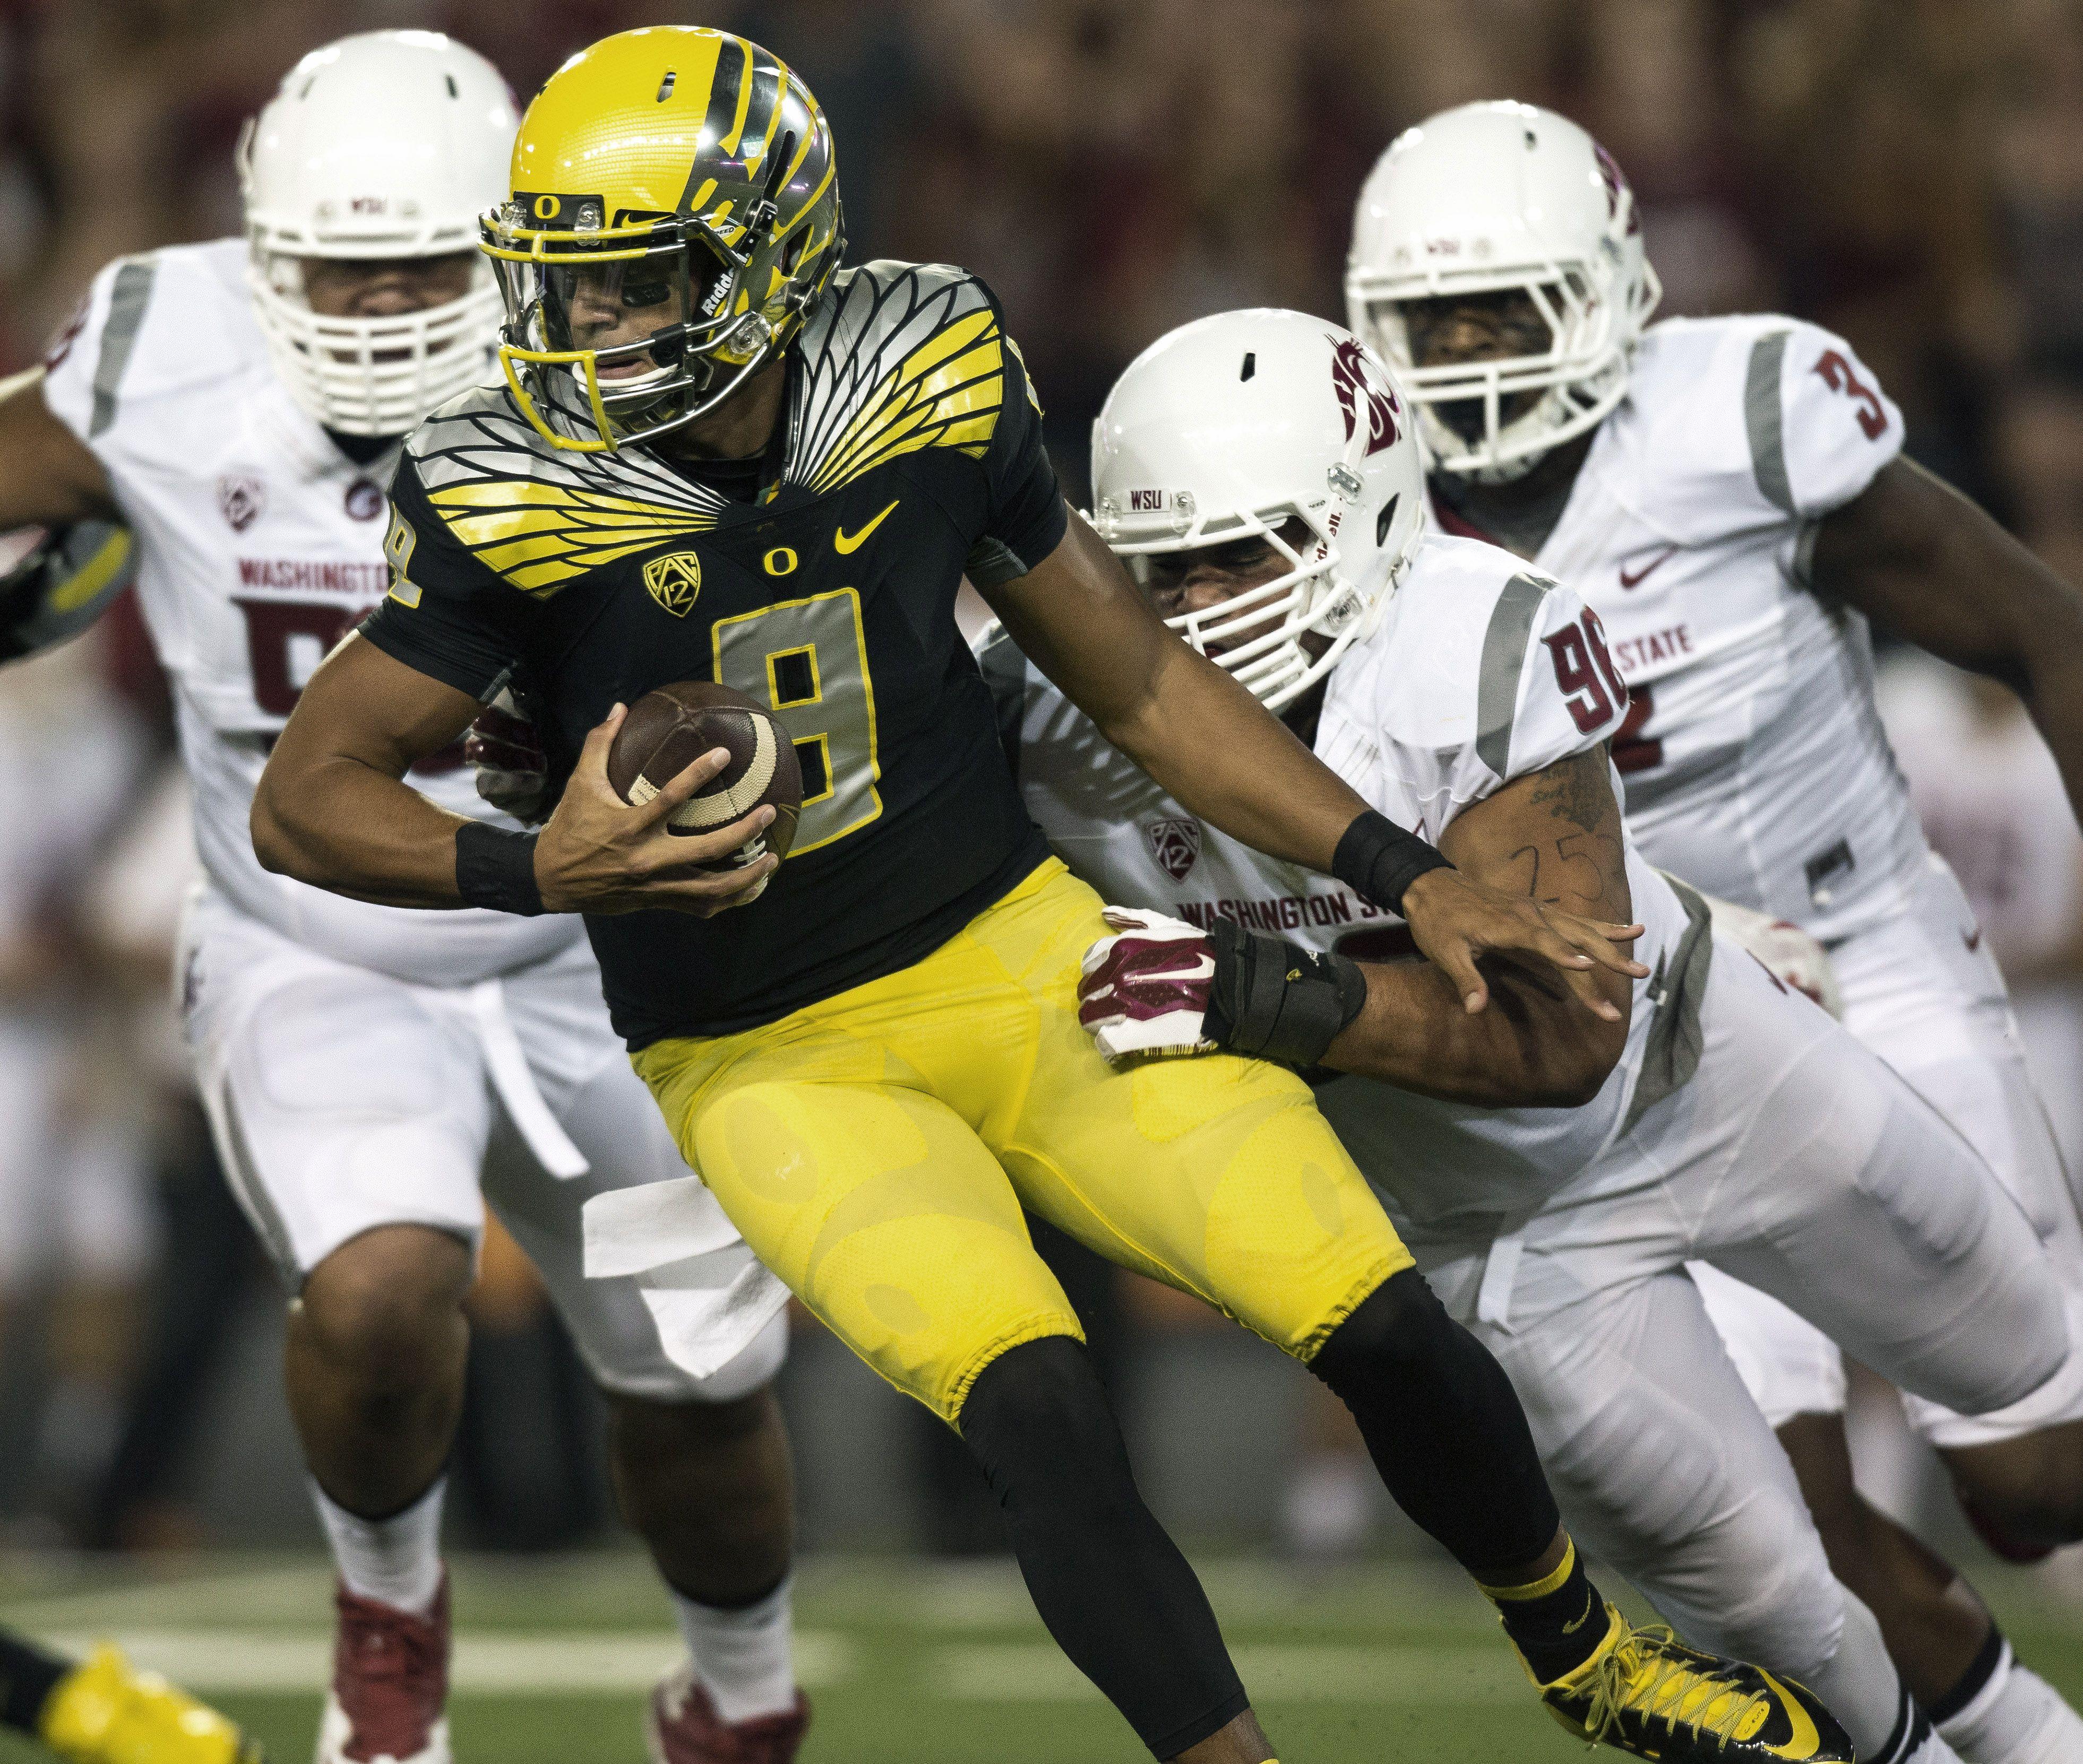 reputable site 51188 5ad06 University of Oregon Ducks yellow helmet, black jerseys in 9 ...